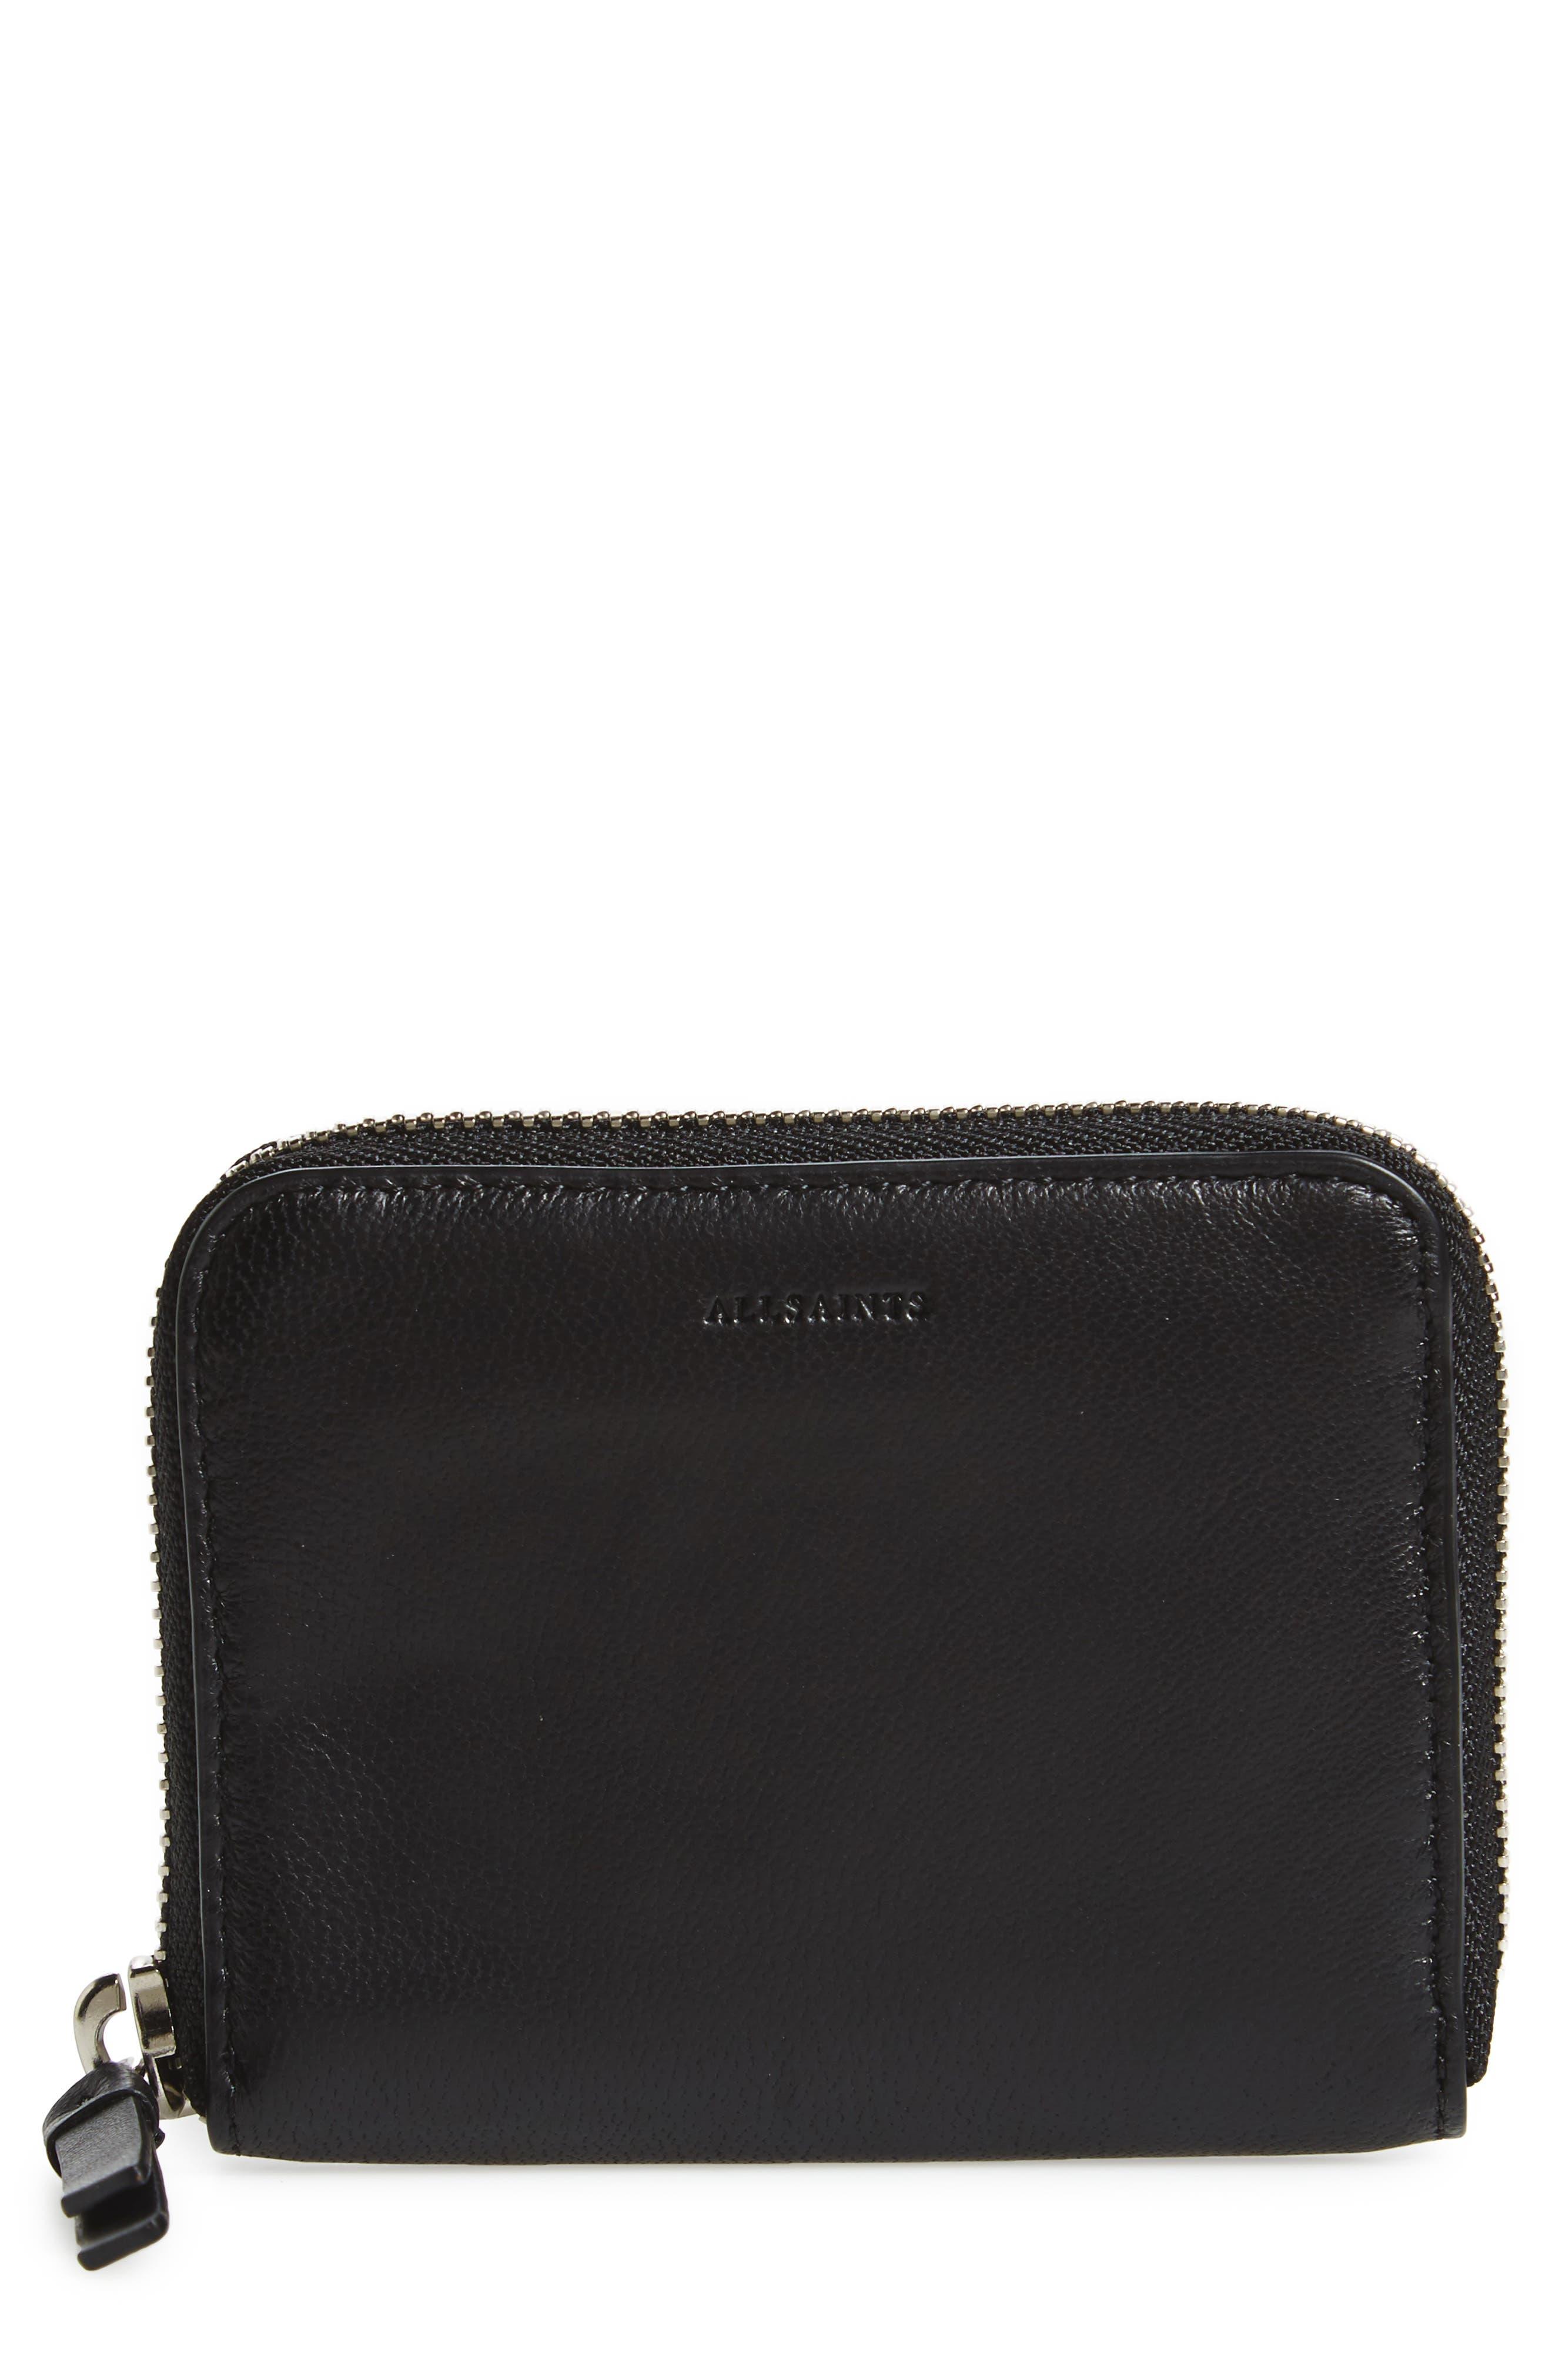 Main Image - ALLSAINTS Kanda Mini Zip Wallet